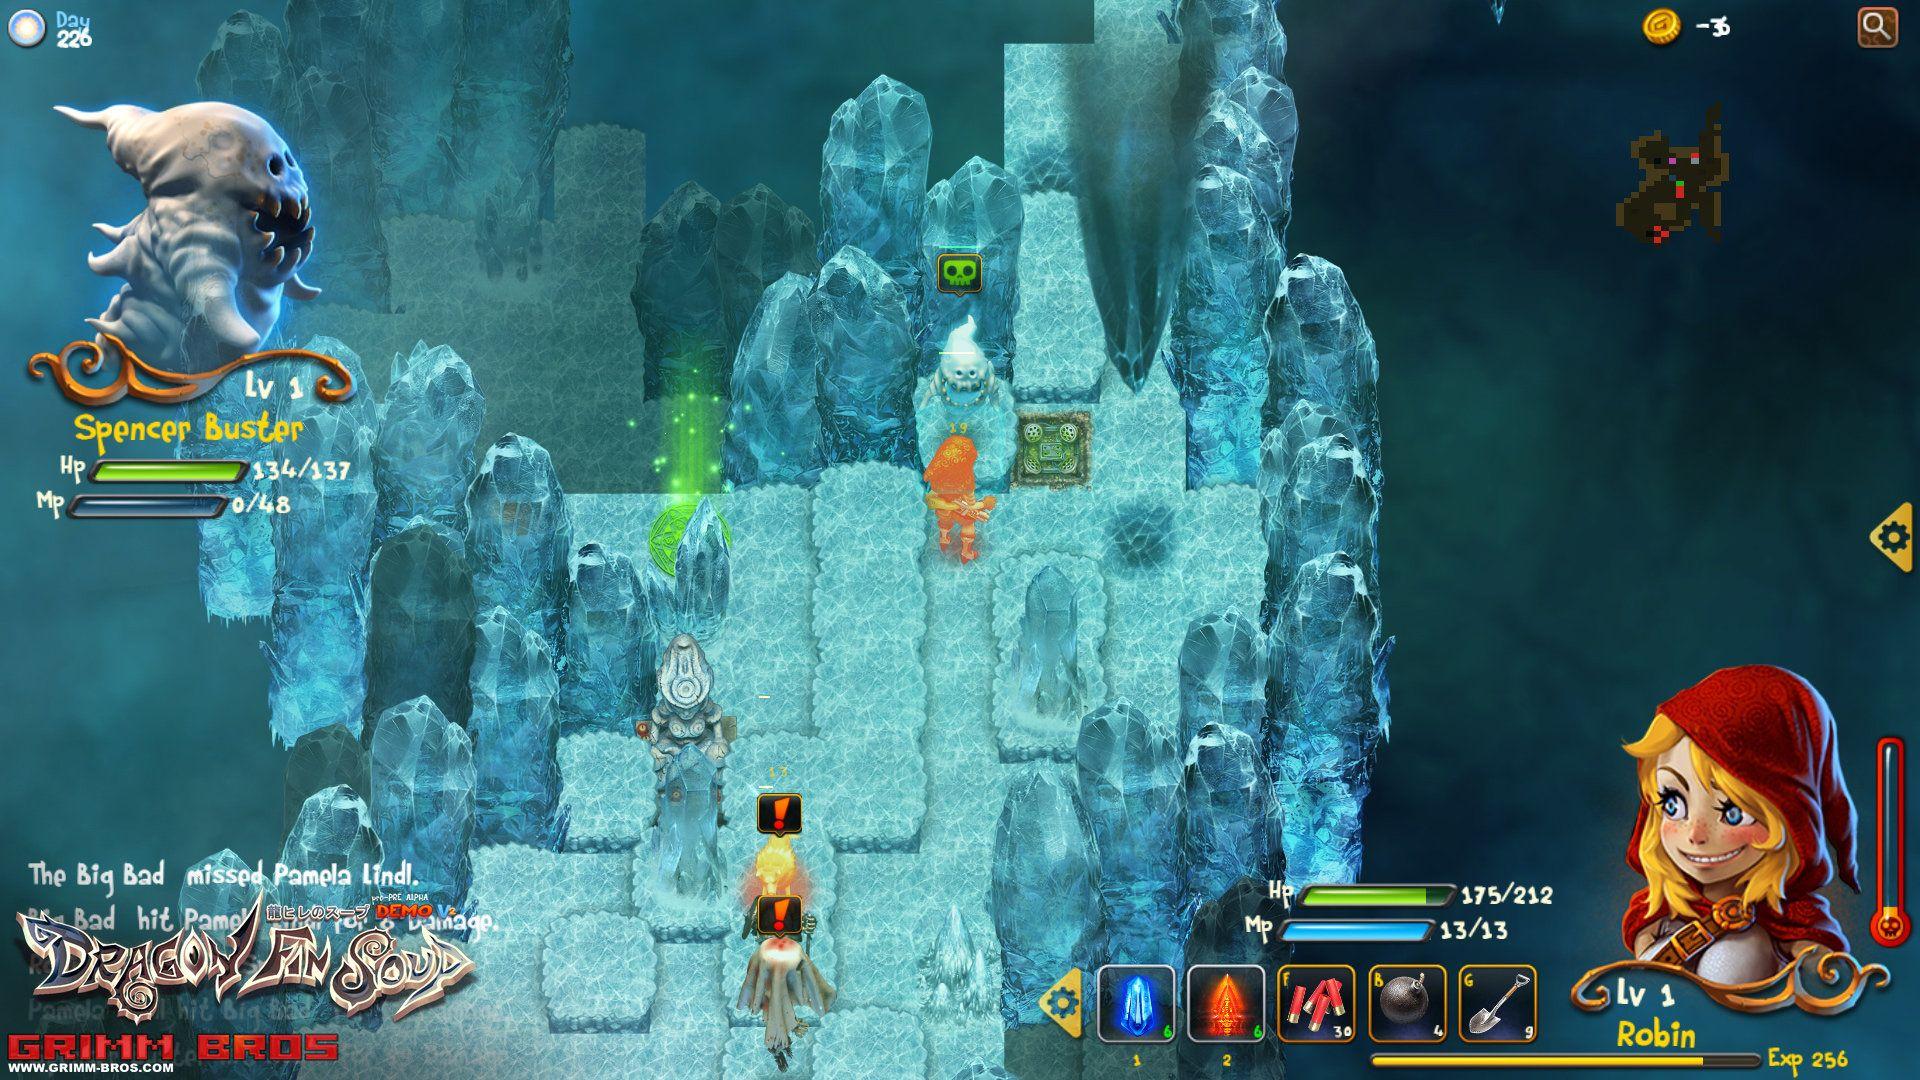 Dragon fin soup ps4 games playstation